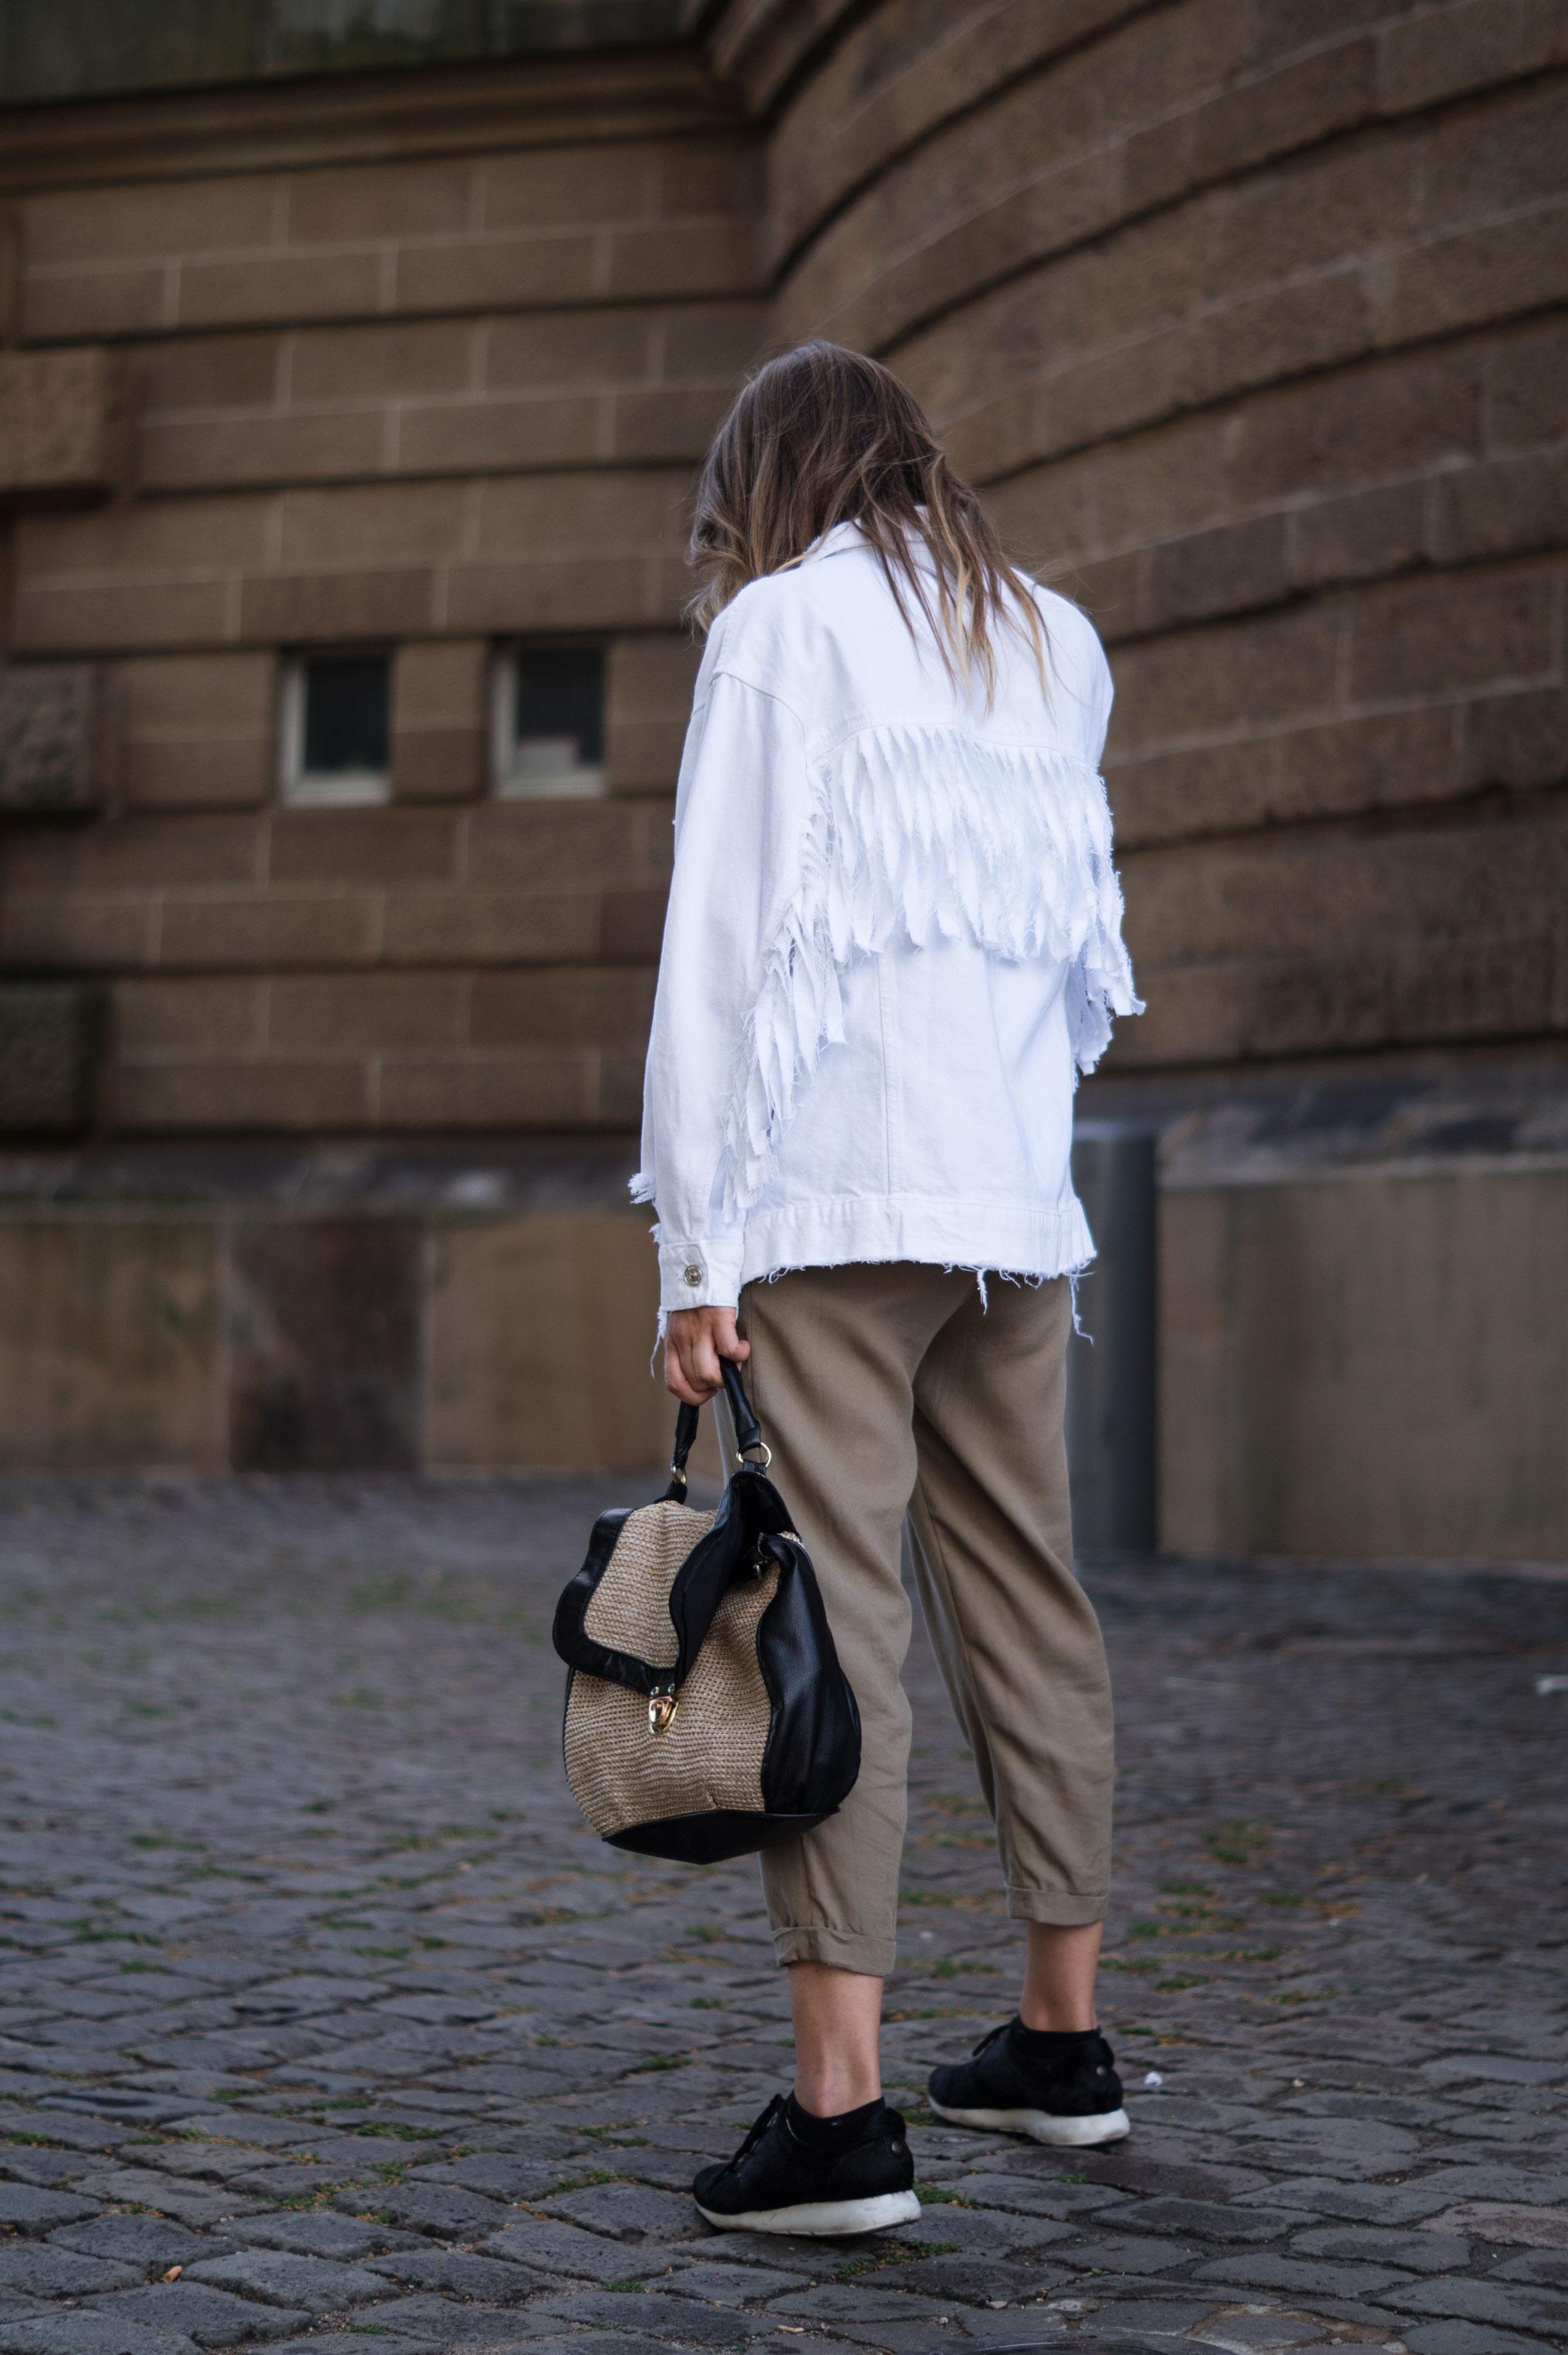 Fringed Denim Jacket Fransenjacke weiße Jeansjacke Casual Outfit Sariety Fashionblogger Modeblog Heidelberg Mannheim Wasserturm-9